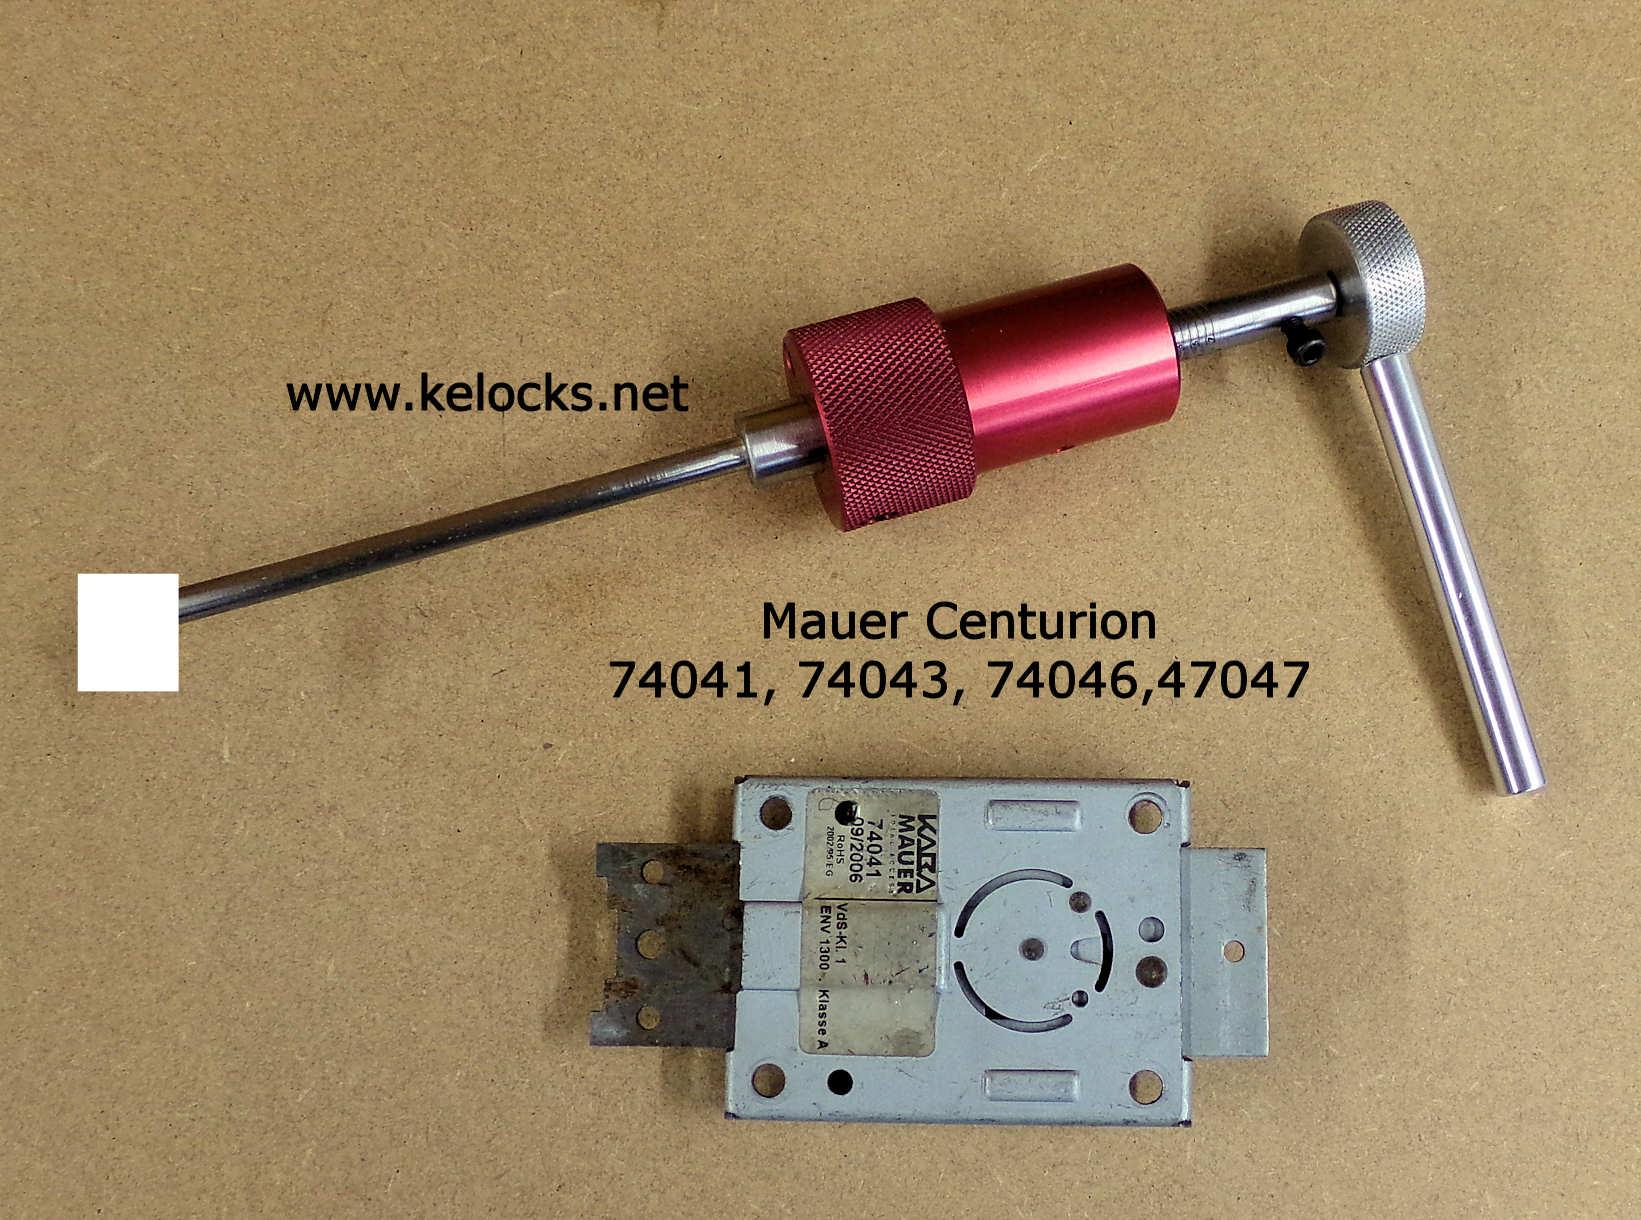 KABA Mauer Centurion Safe Lock Pick 74041, 74043, 74046, 74047